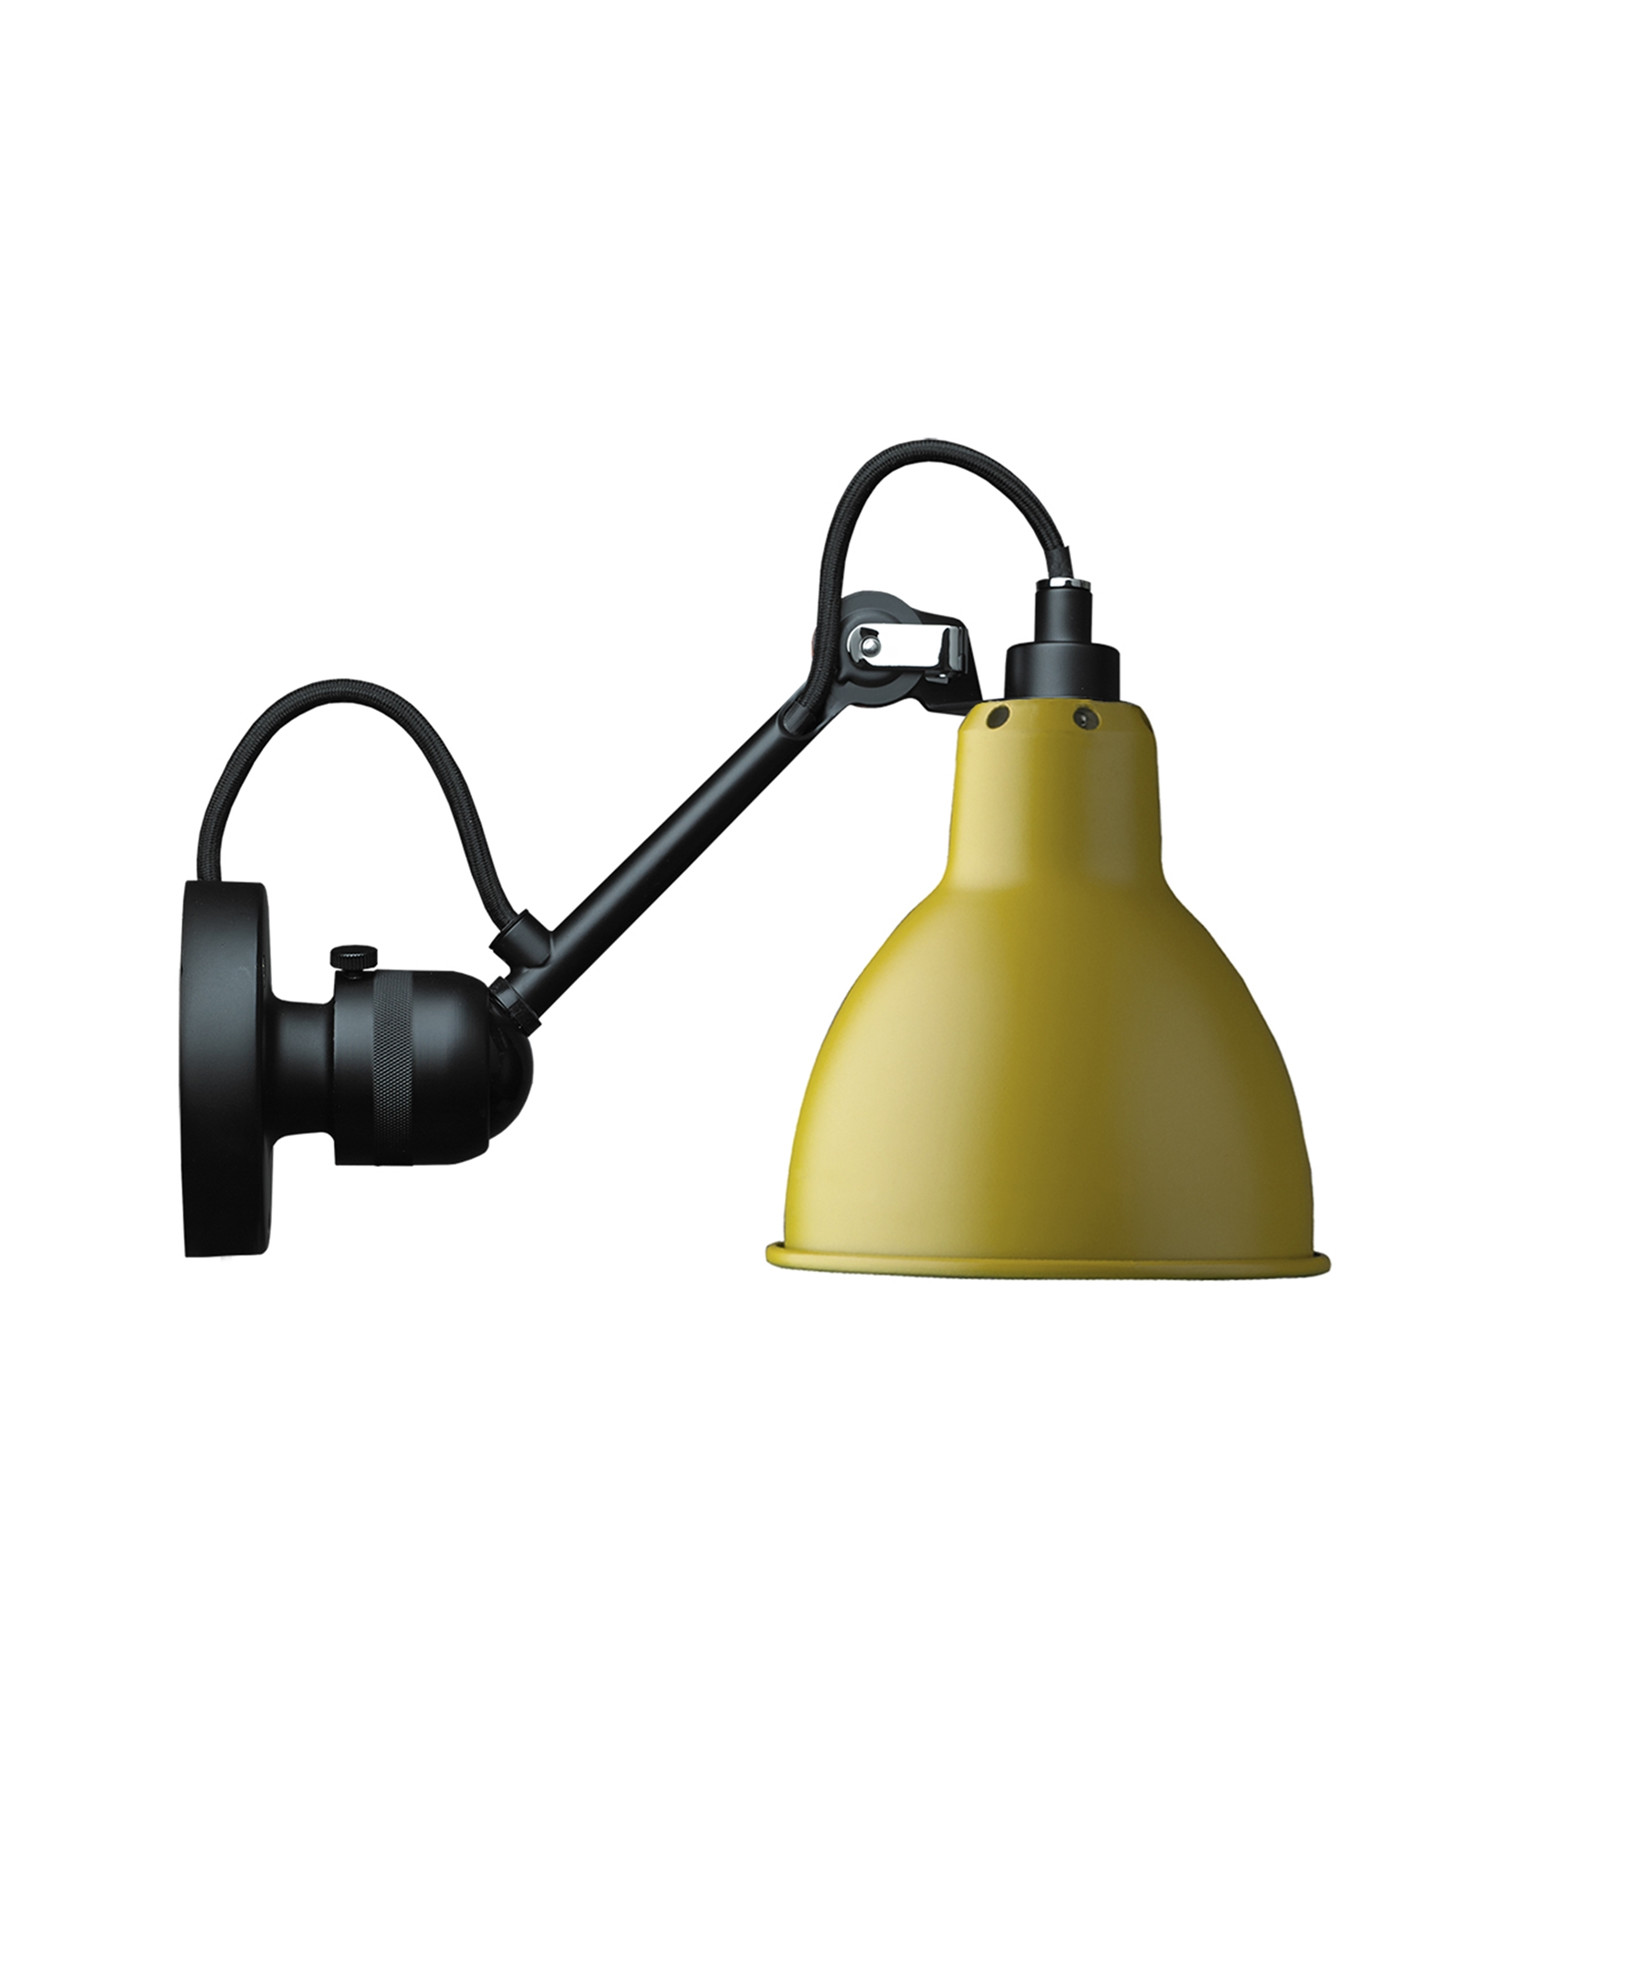 304 wandleuchte gelb lampe gras. Black Bedroom Furniture Sets. Home Design Ideas